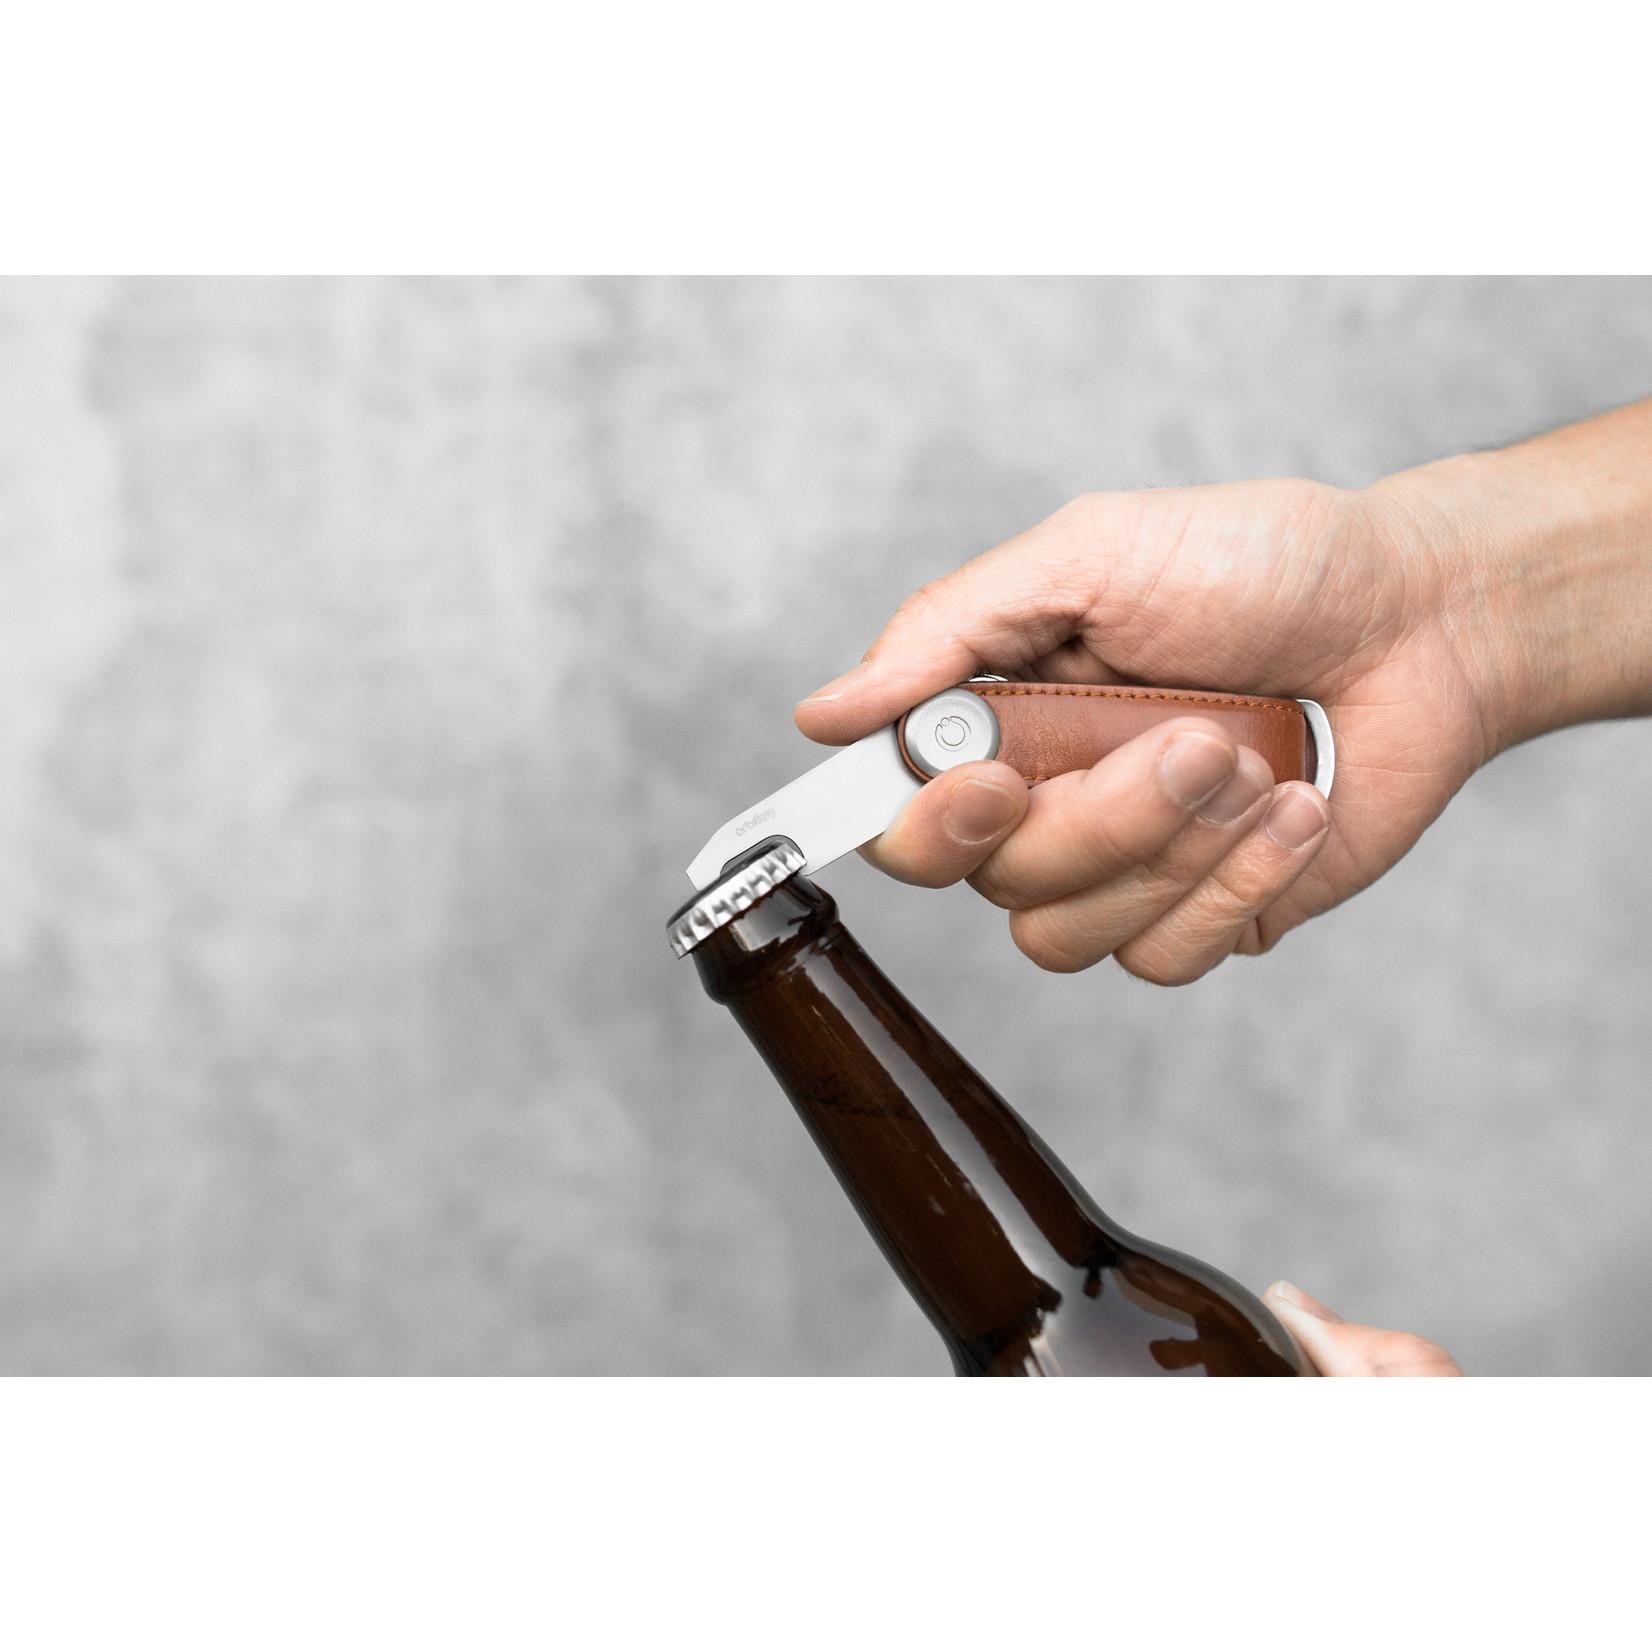 Orbitkey 2.0 accessoire flessenopener